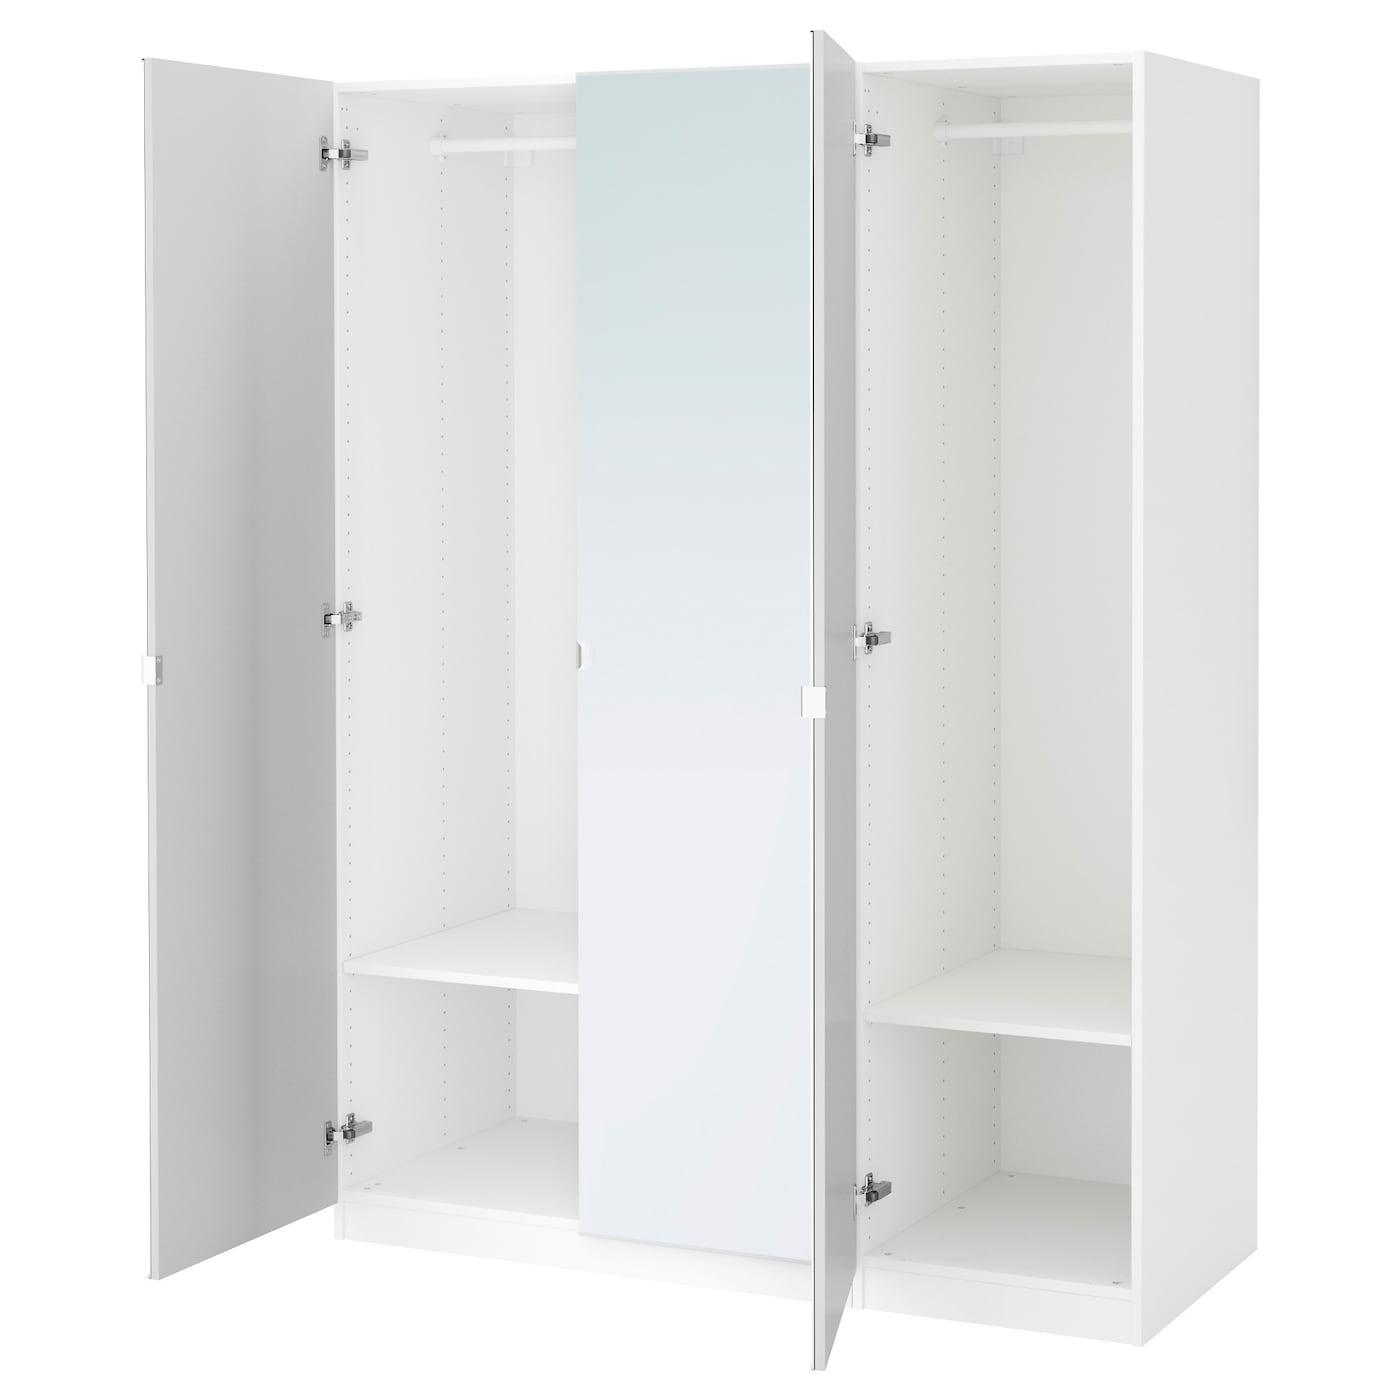 pax armoire penderie blanc vikedal miroir 150 x 60 x 201 cm ikea. Black Bedroom Furniture Sets. Home Design Ideas